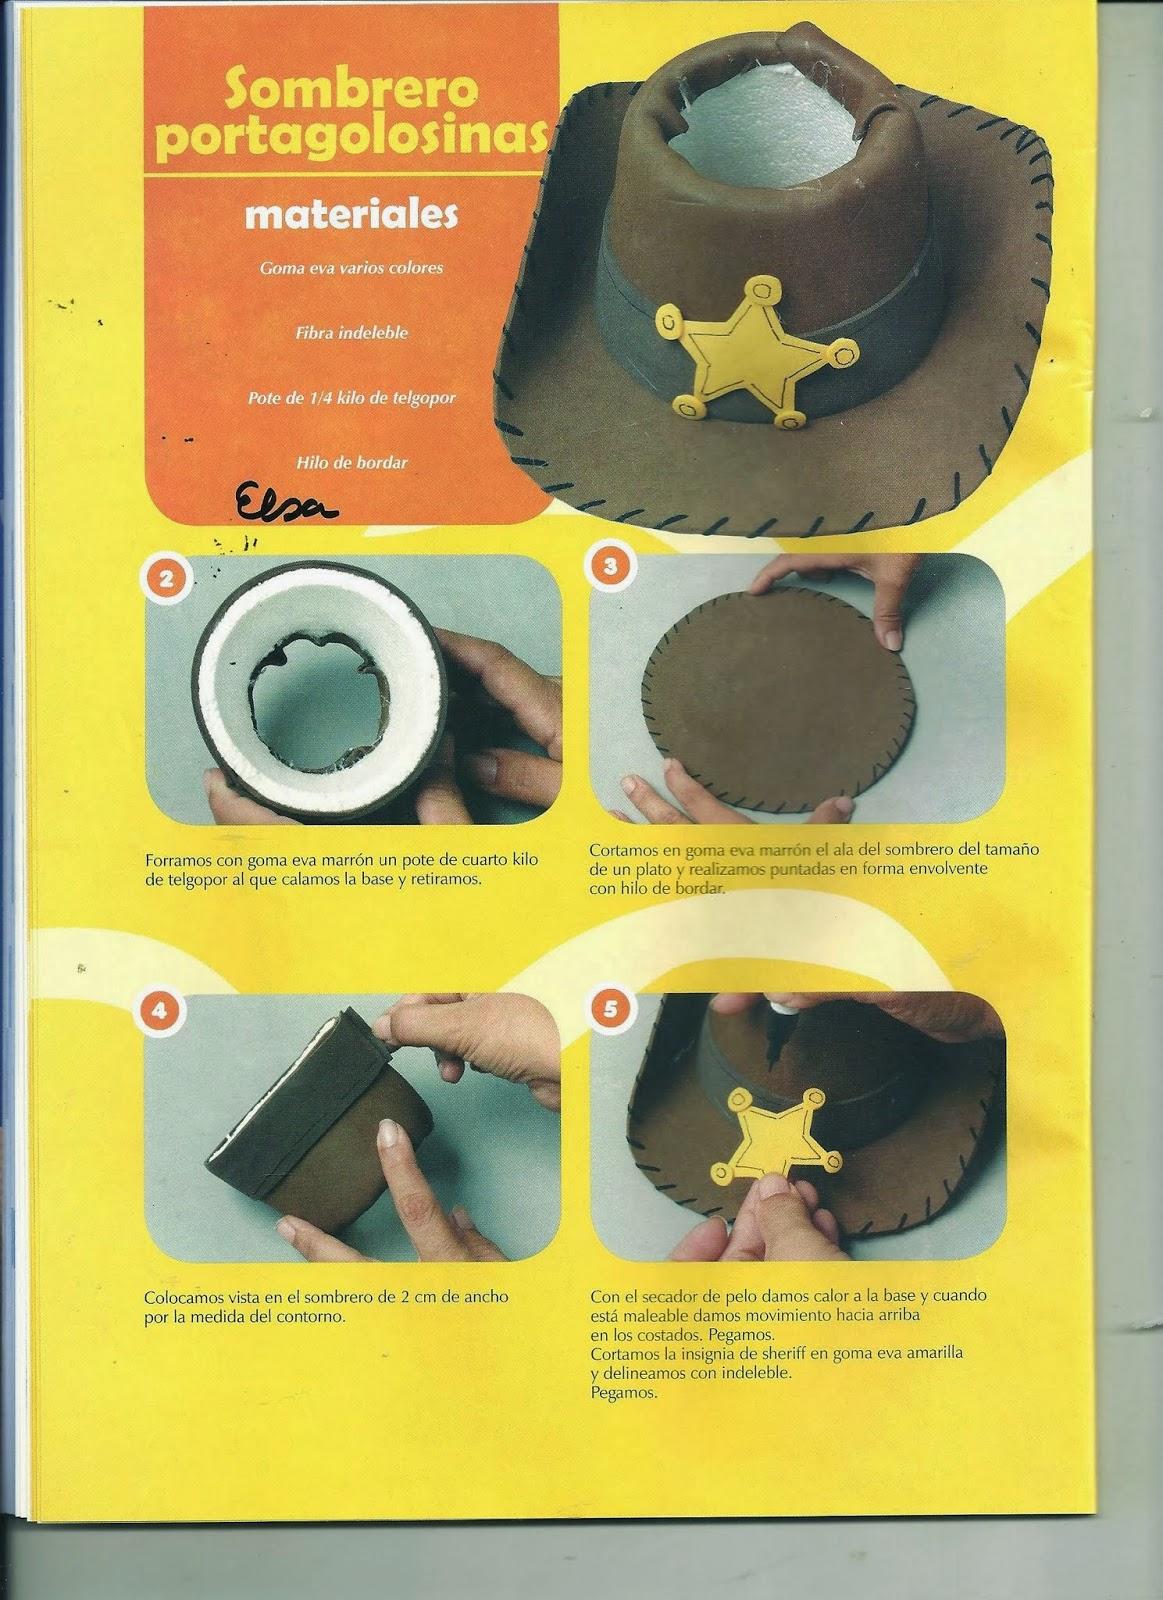 como hacer vaquera en foami - Revistas de manualidades gratis 0cbe9bb17d3